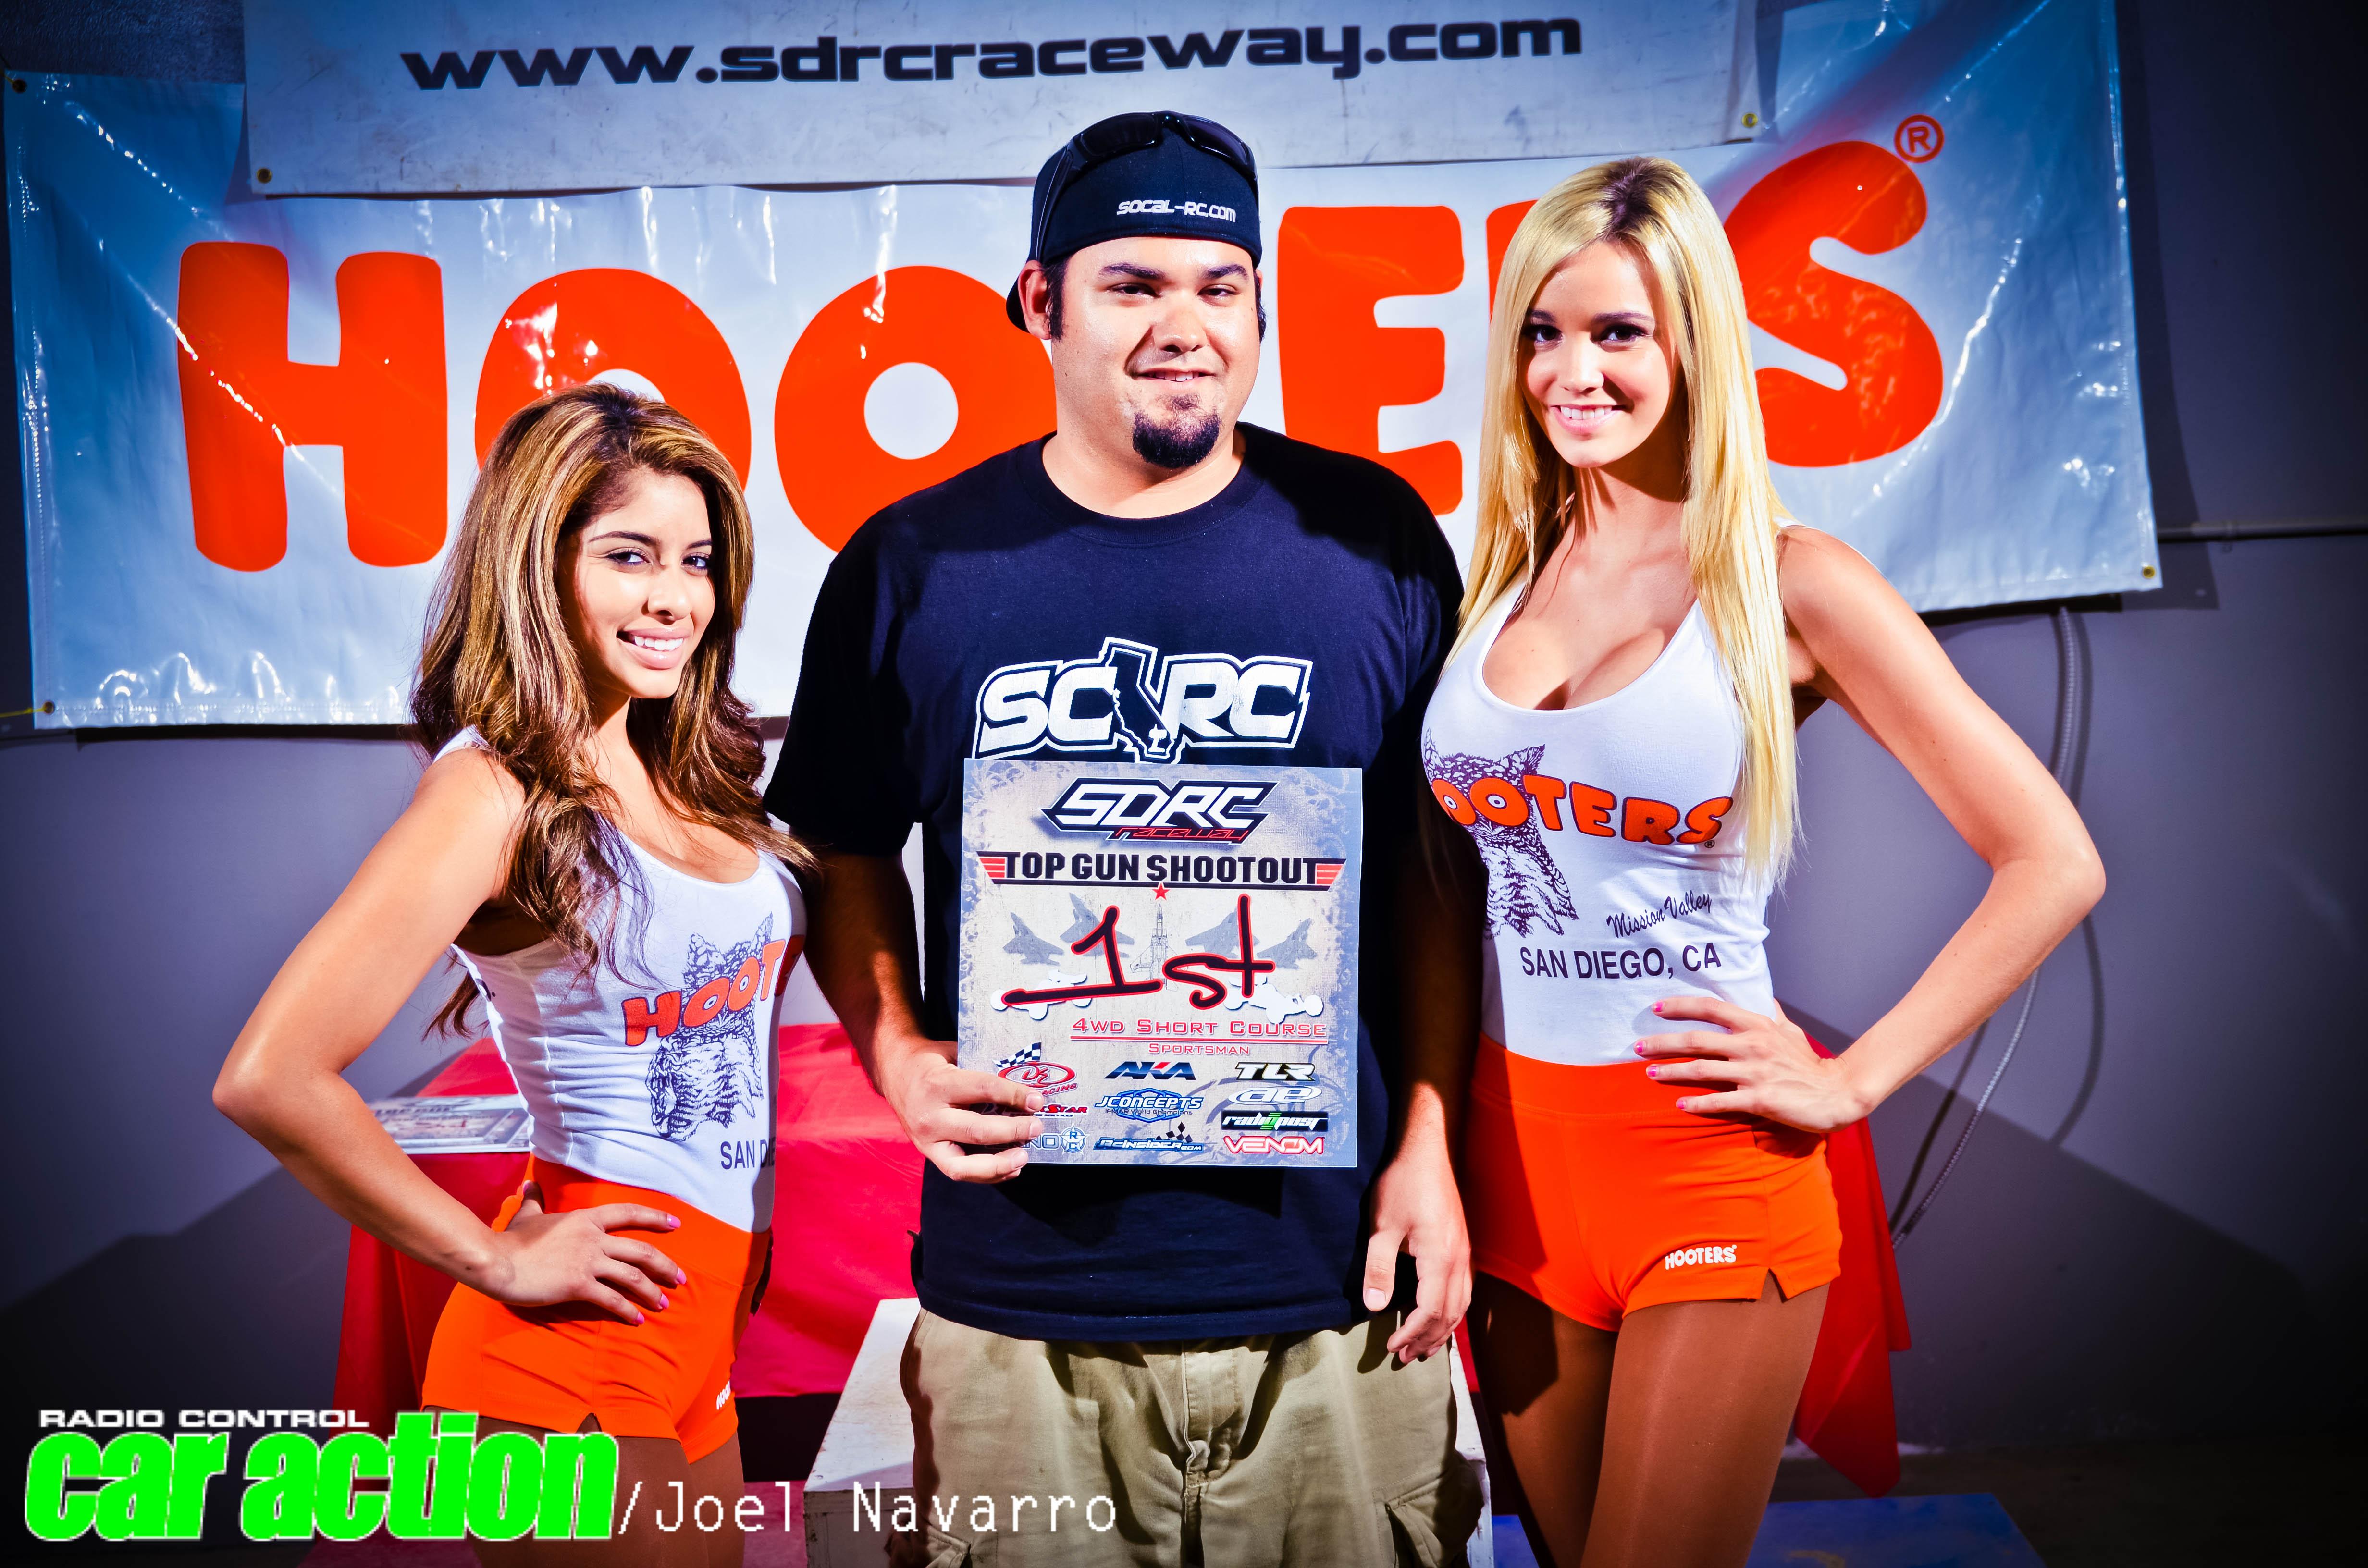 0210 Top Gun Shootout 2012 @ SDRC